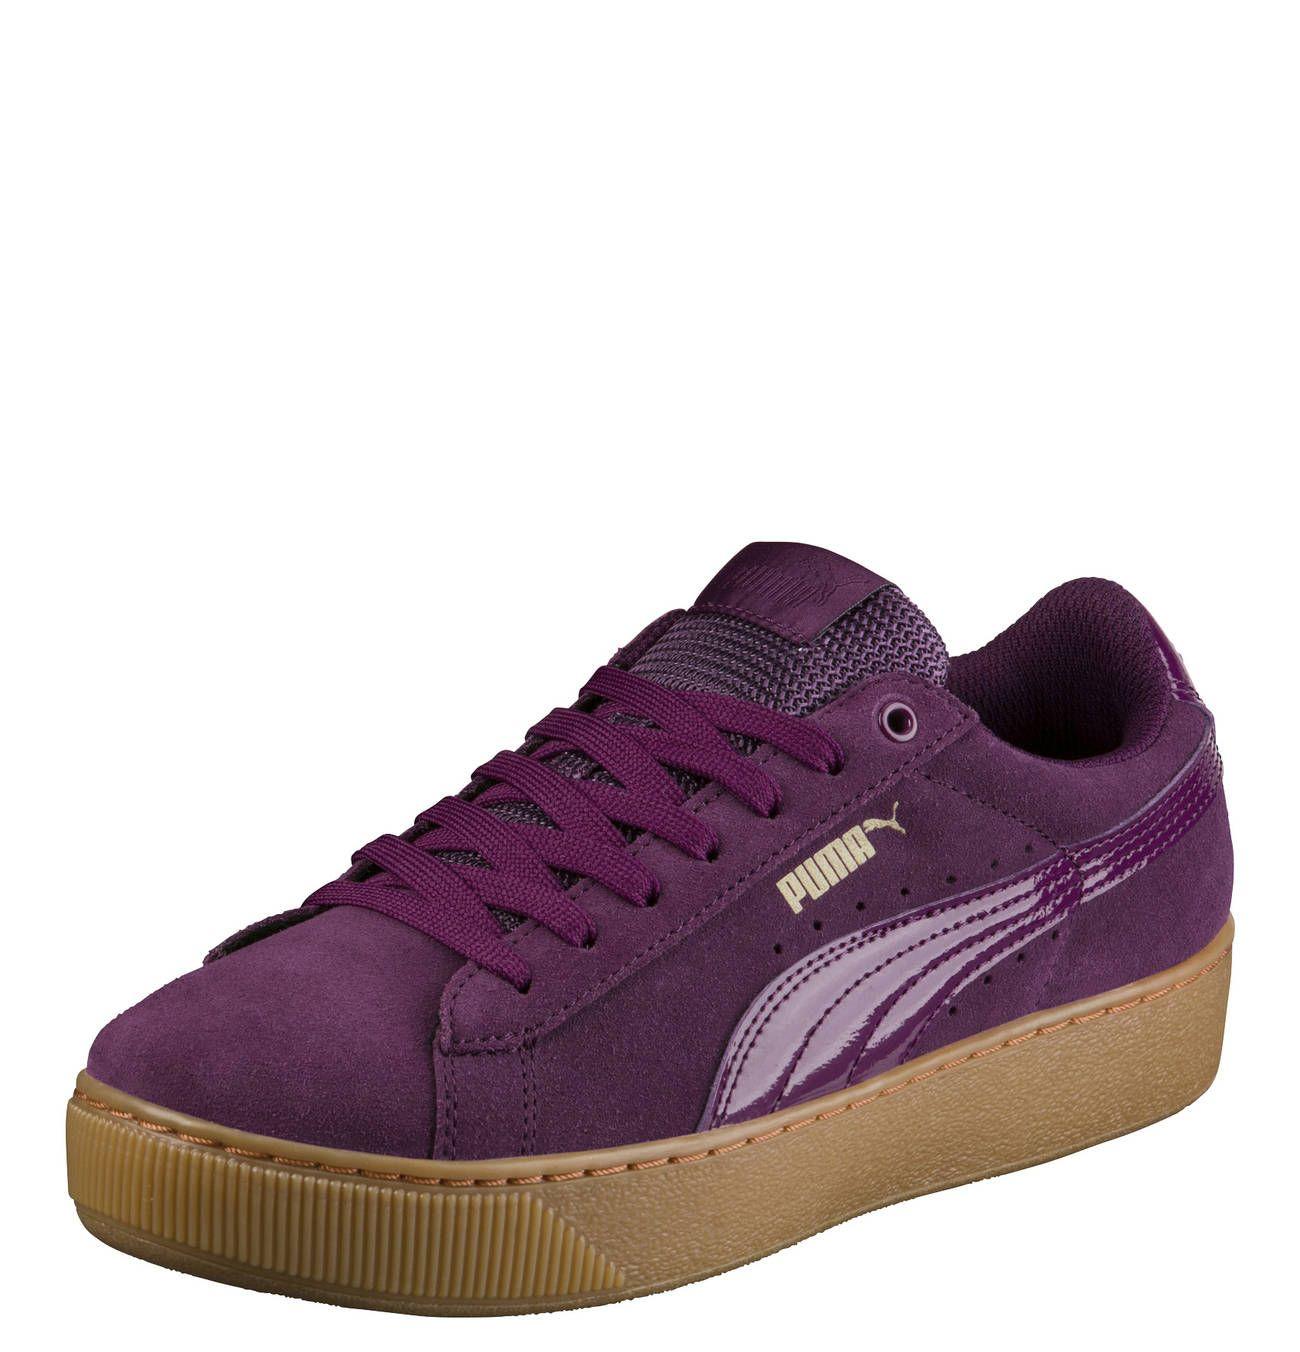 PUMA Vikky Damen Sneaker Violett Damenschuhe Sneaker